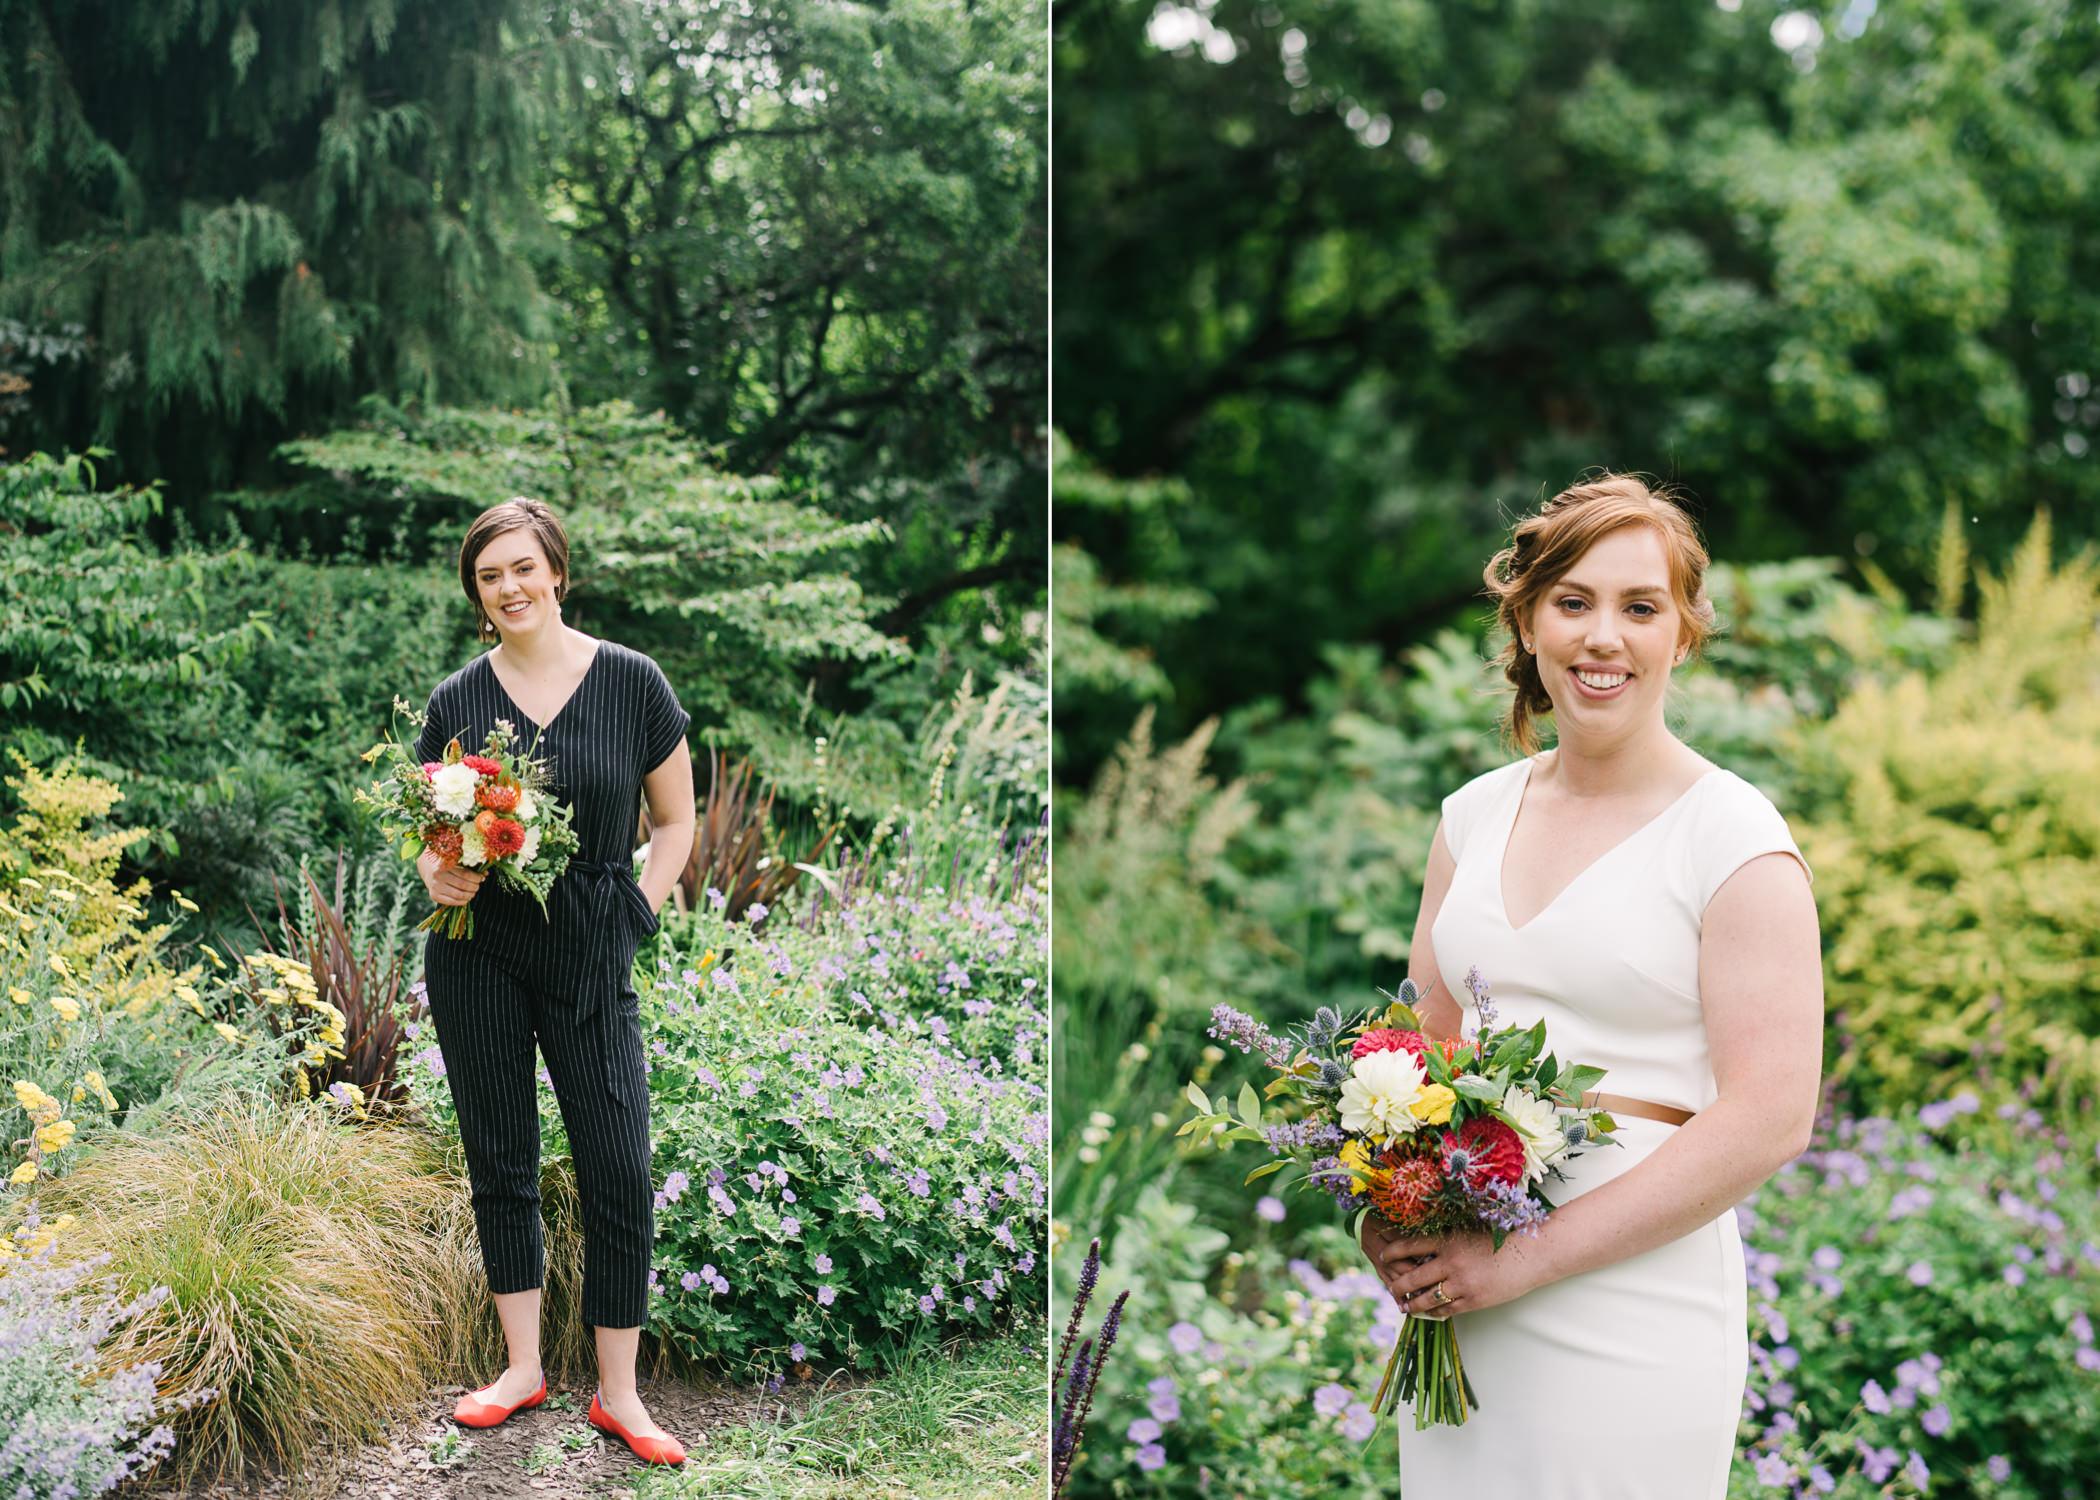 cathedral-park-portland-elopement-gay-wedding-052.JPG